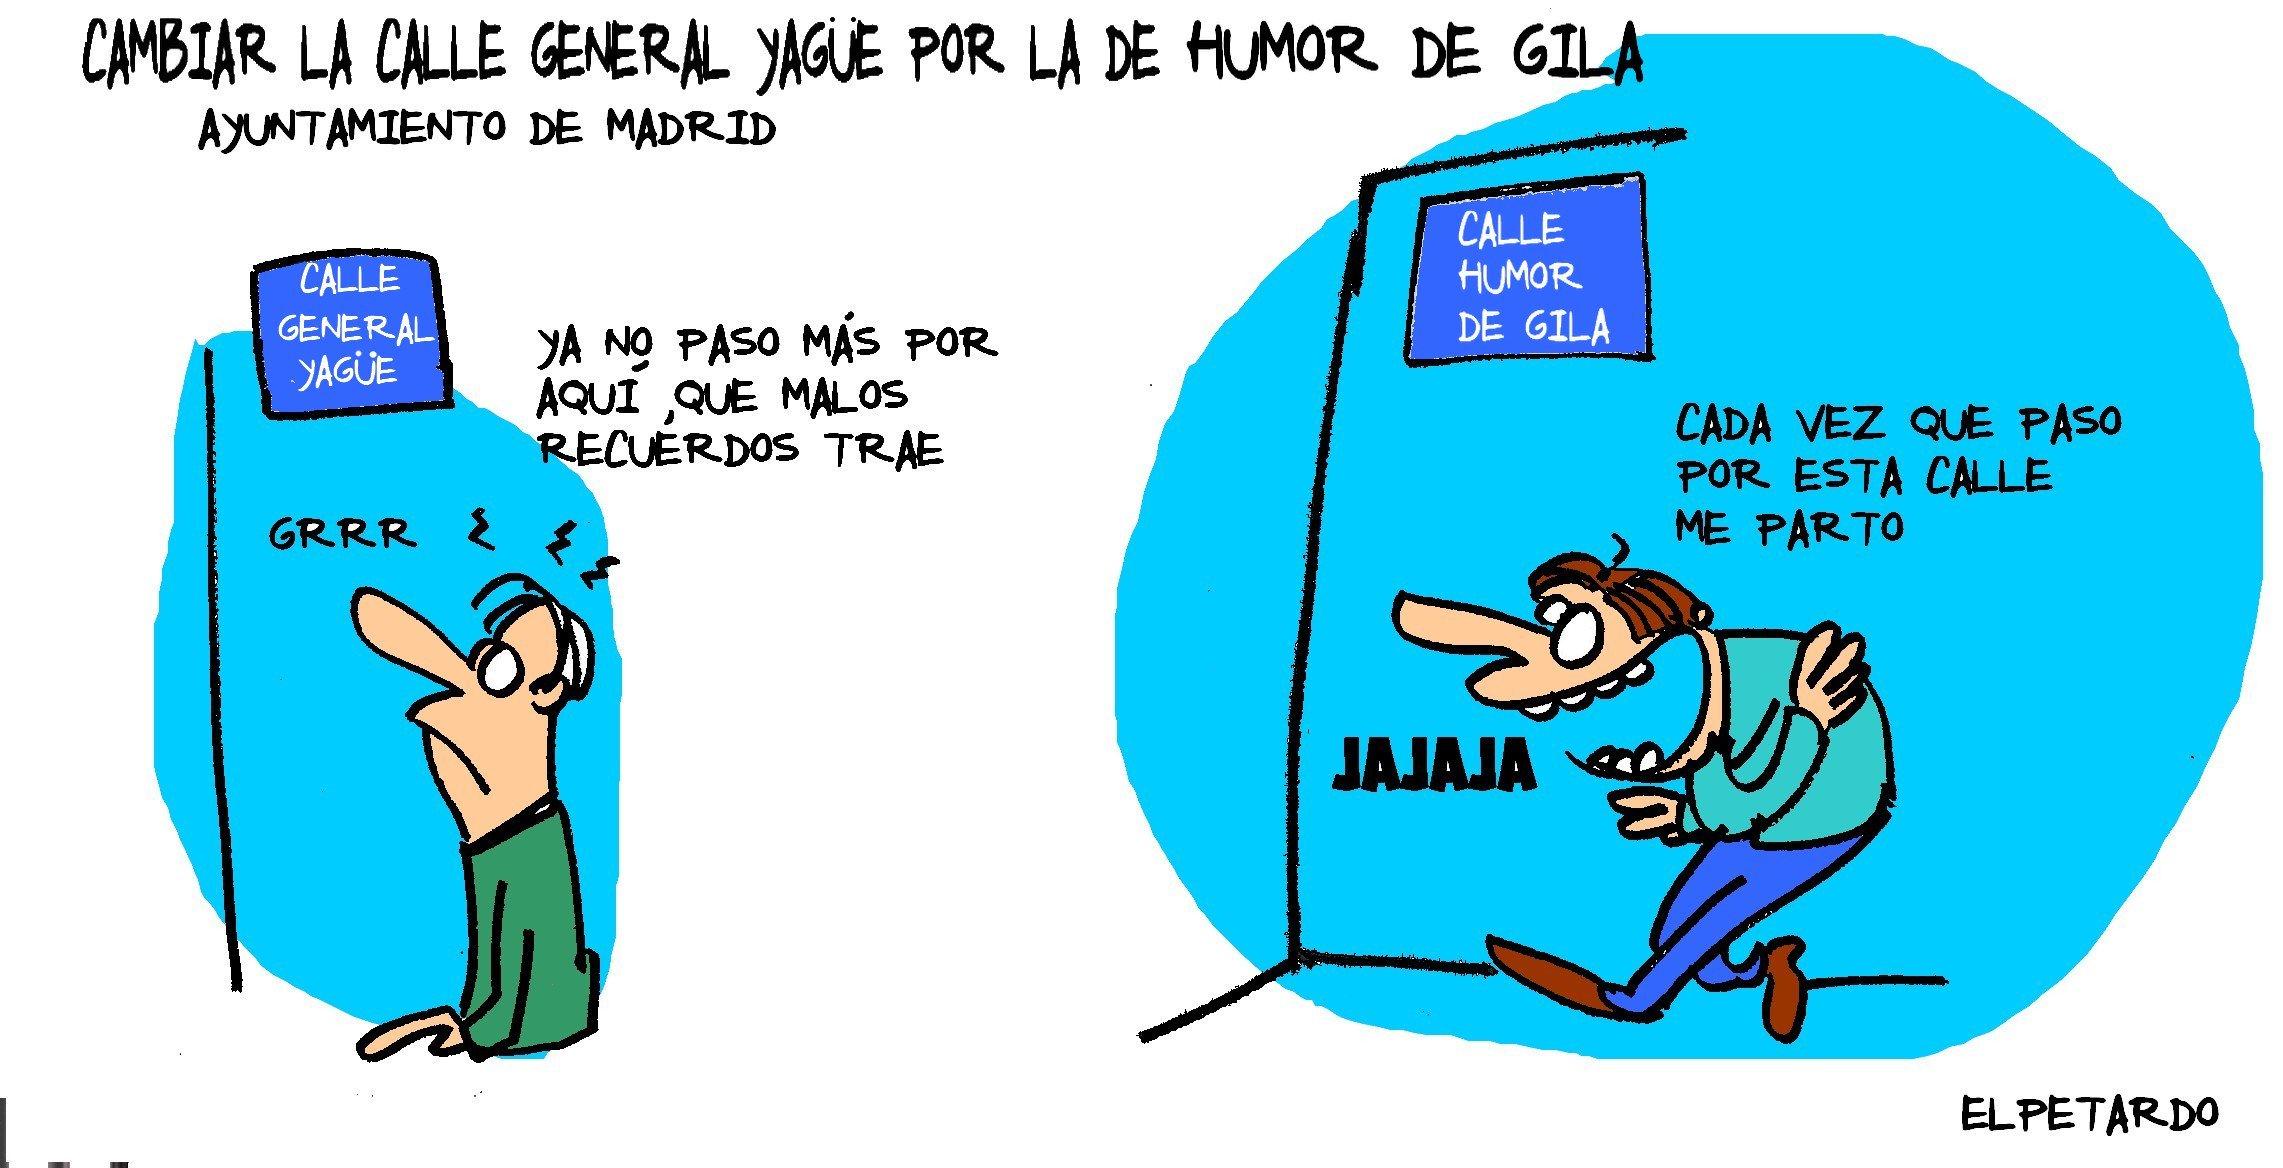 avenida-miguel-gila-change-2